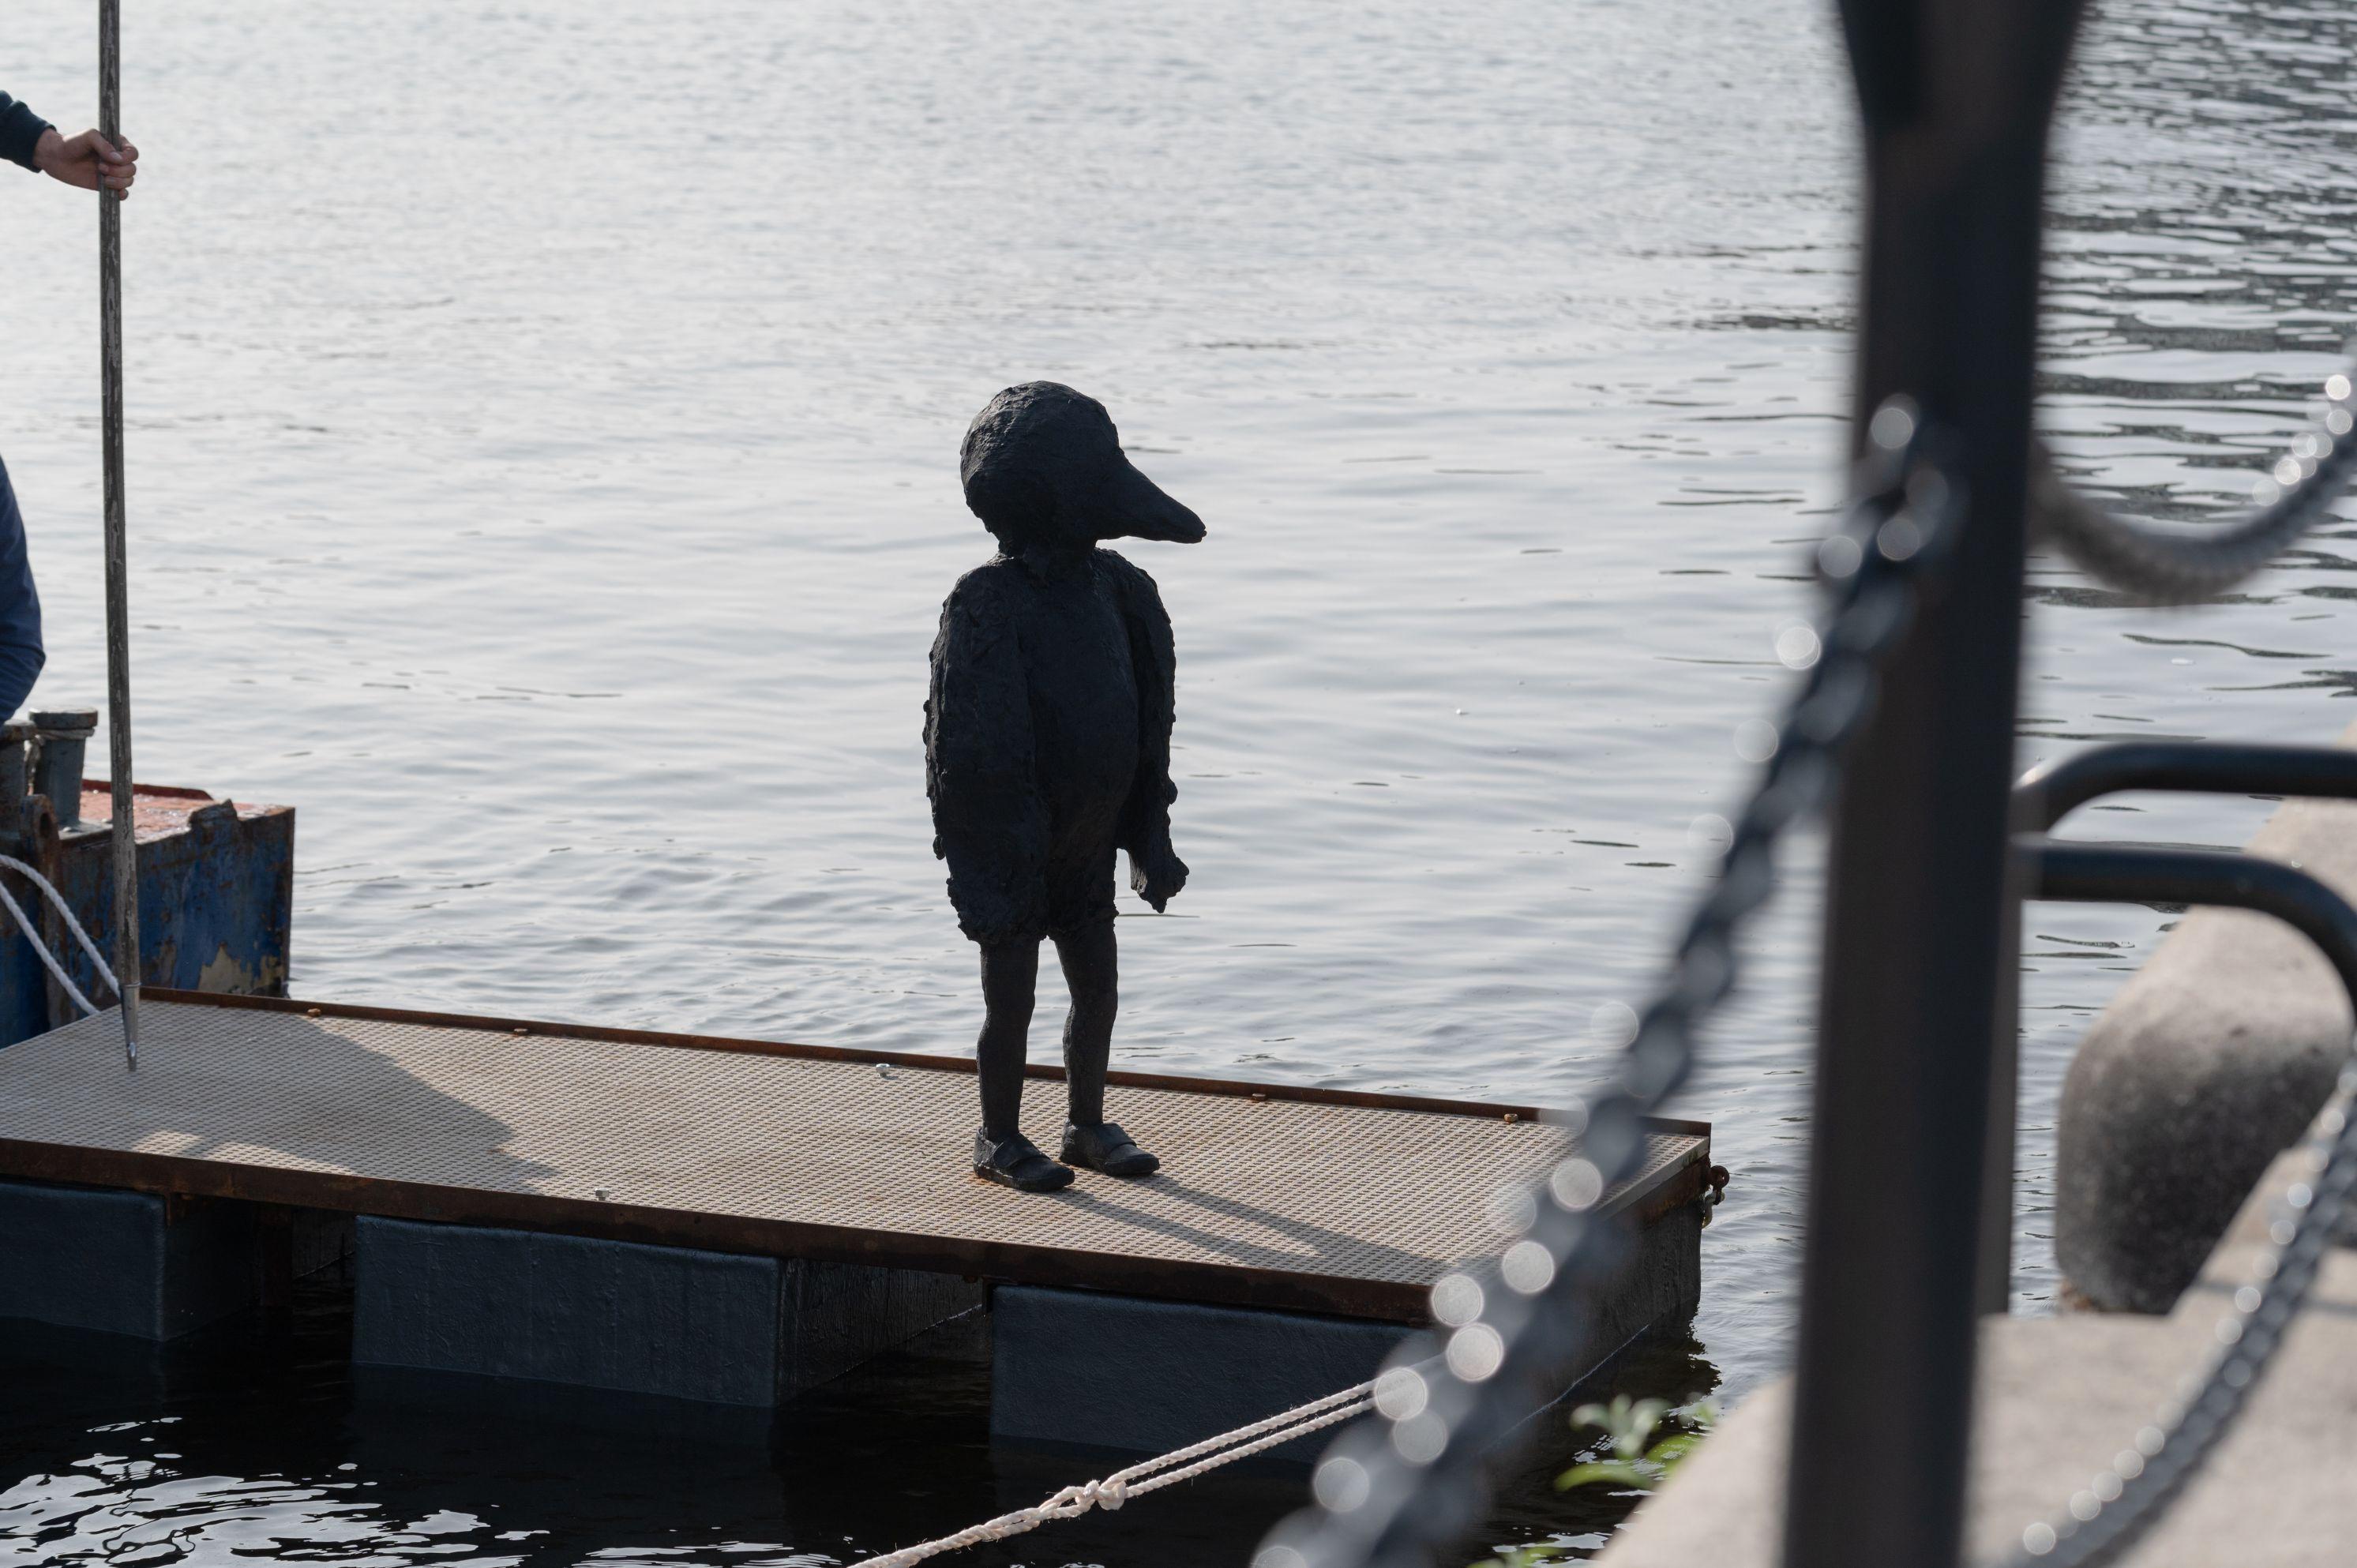 Statue in Royal Victoria Dock called Bird Boy